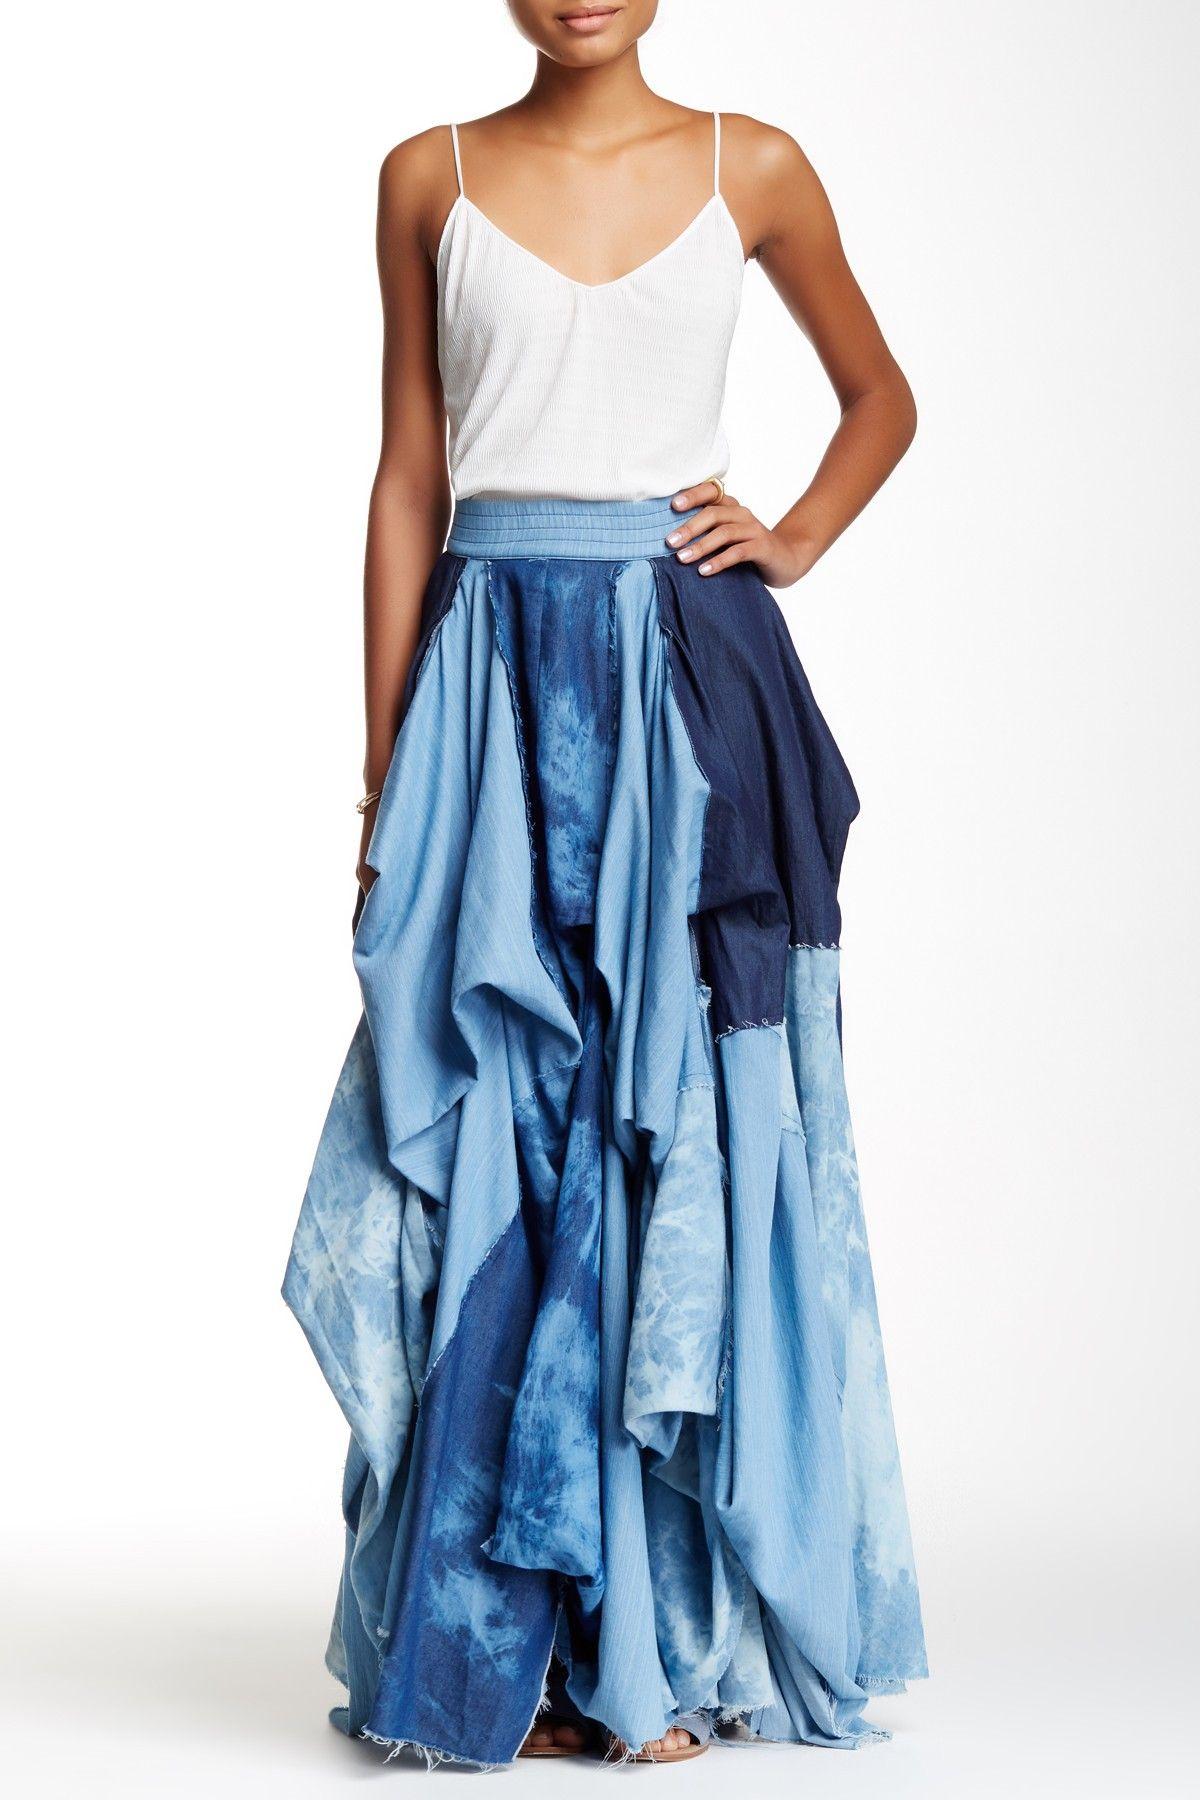 62c4c2eb6 TOV | Draped Denim Maxi Skirt | Rock that style! | Skirts, Denim ...